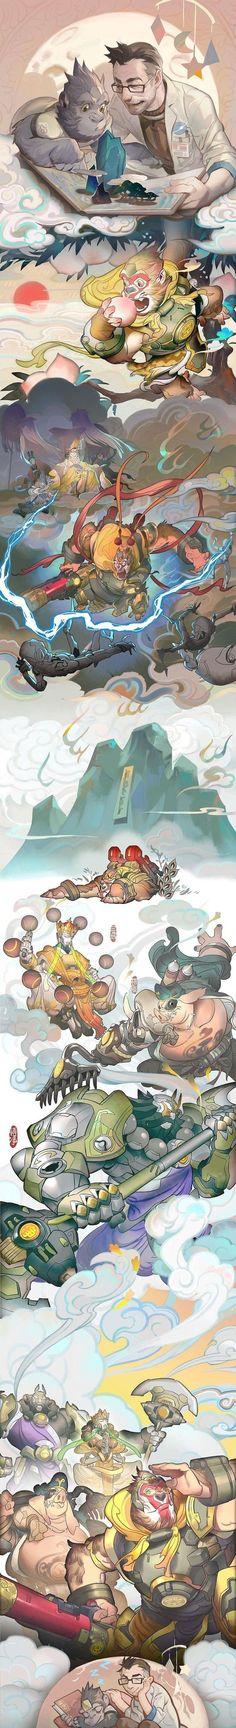 Overwatch ♤♡◇♧ fanart event year of the rooster winston roadhog zenyatta reinhardt Overwatch Comic, Overwatch Fan Art, Overwatch Drawings, Art And Illustration, Illustrations, Overwatch Winston, Photo Manga, Heroes Of The Storm, Game Art